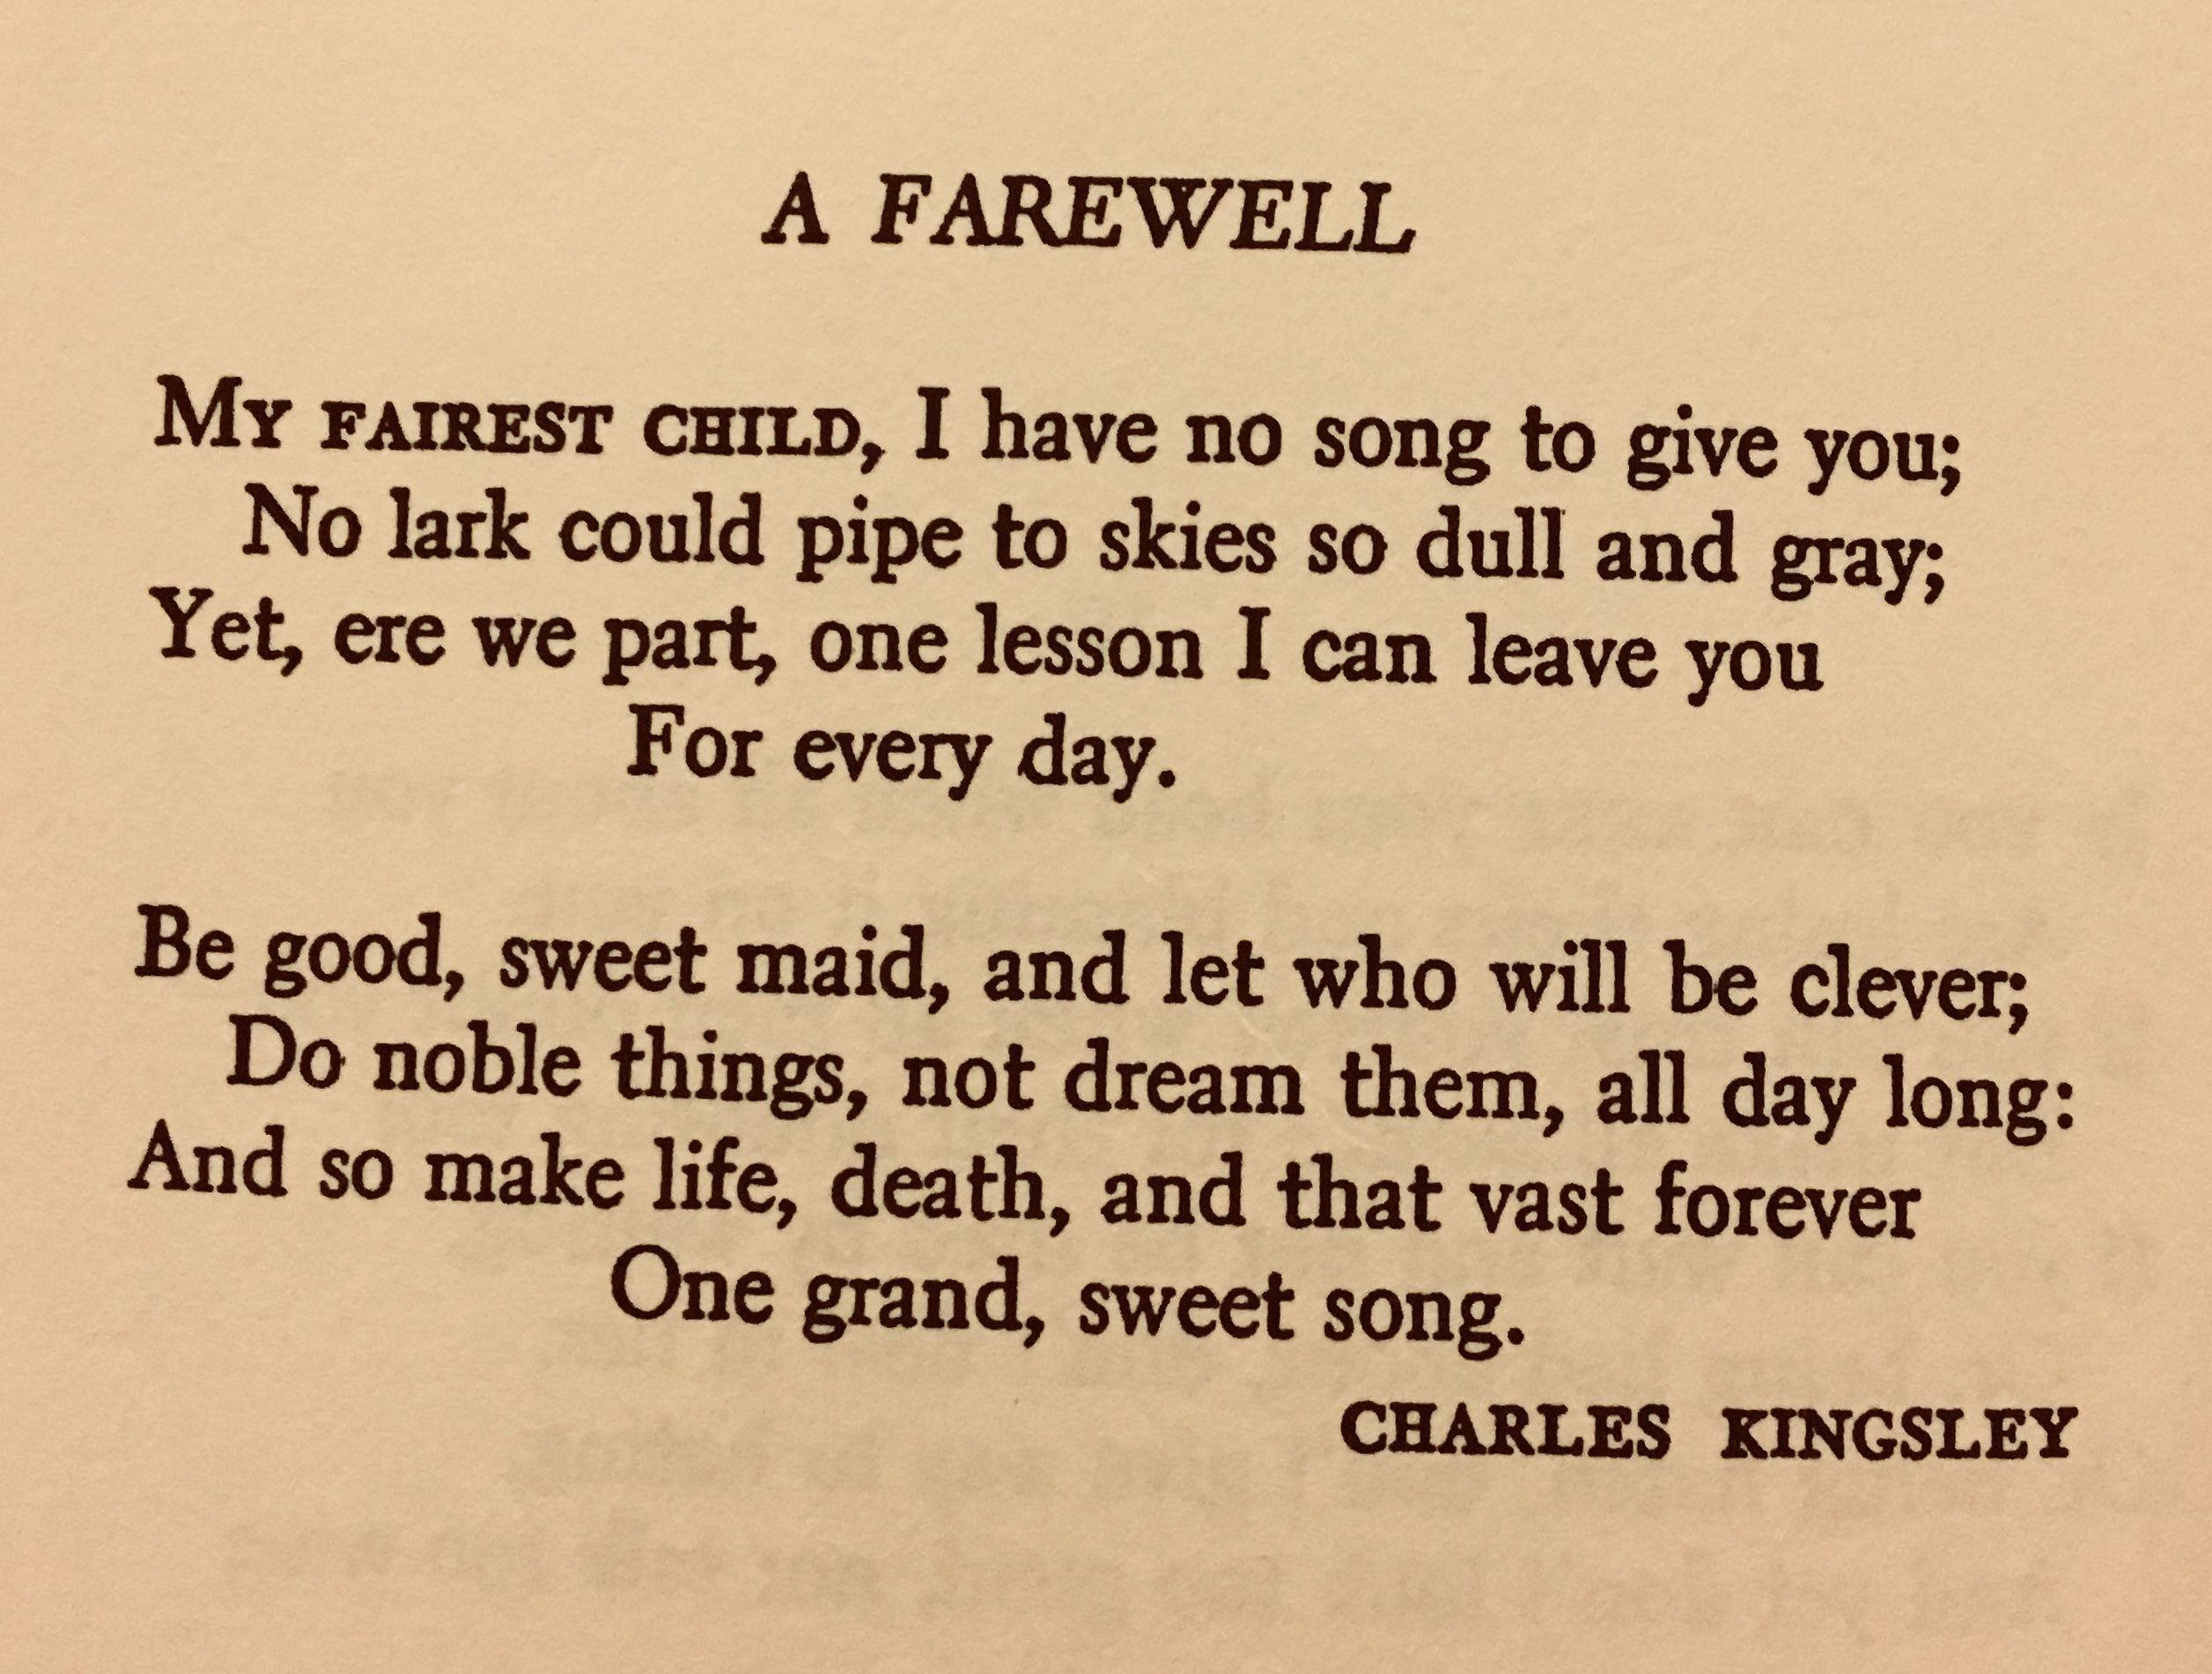 Poem A Farewell Charles Kingsley | Poems | Farewell poems